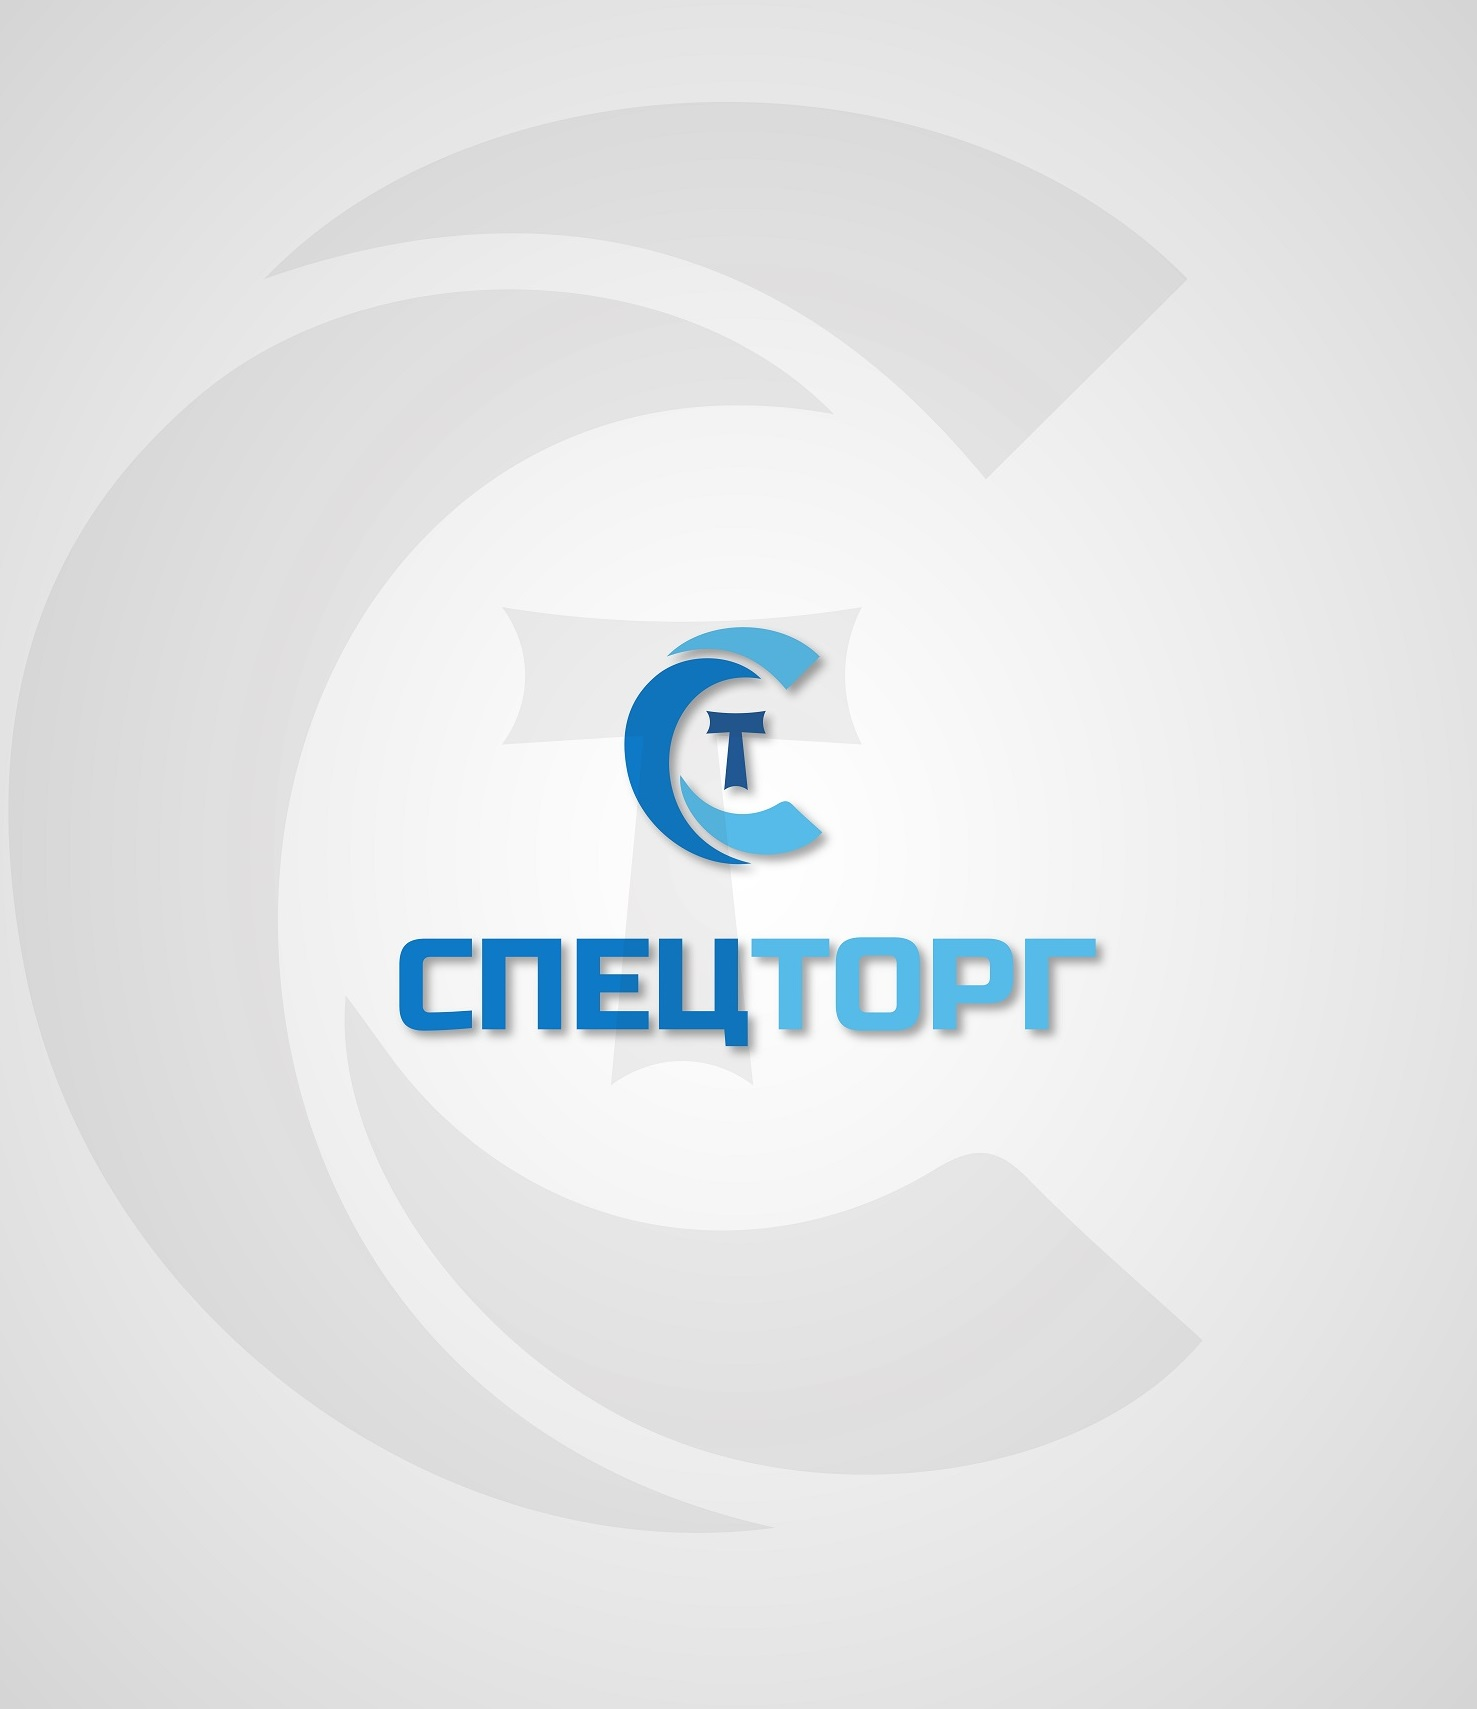 Разработать дизайн  логотипа компании фото f_1805dc94aa0b2251.jpg